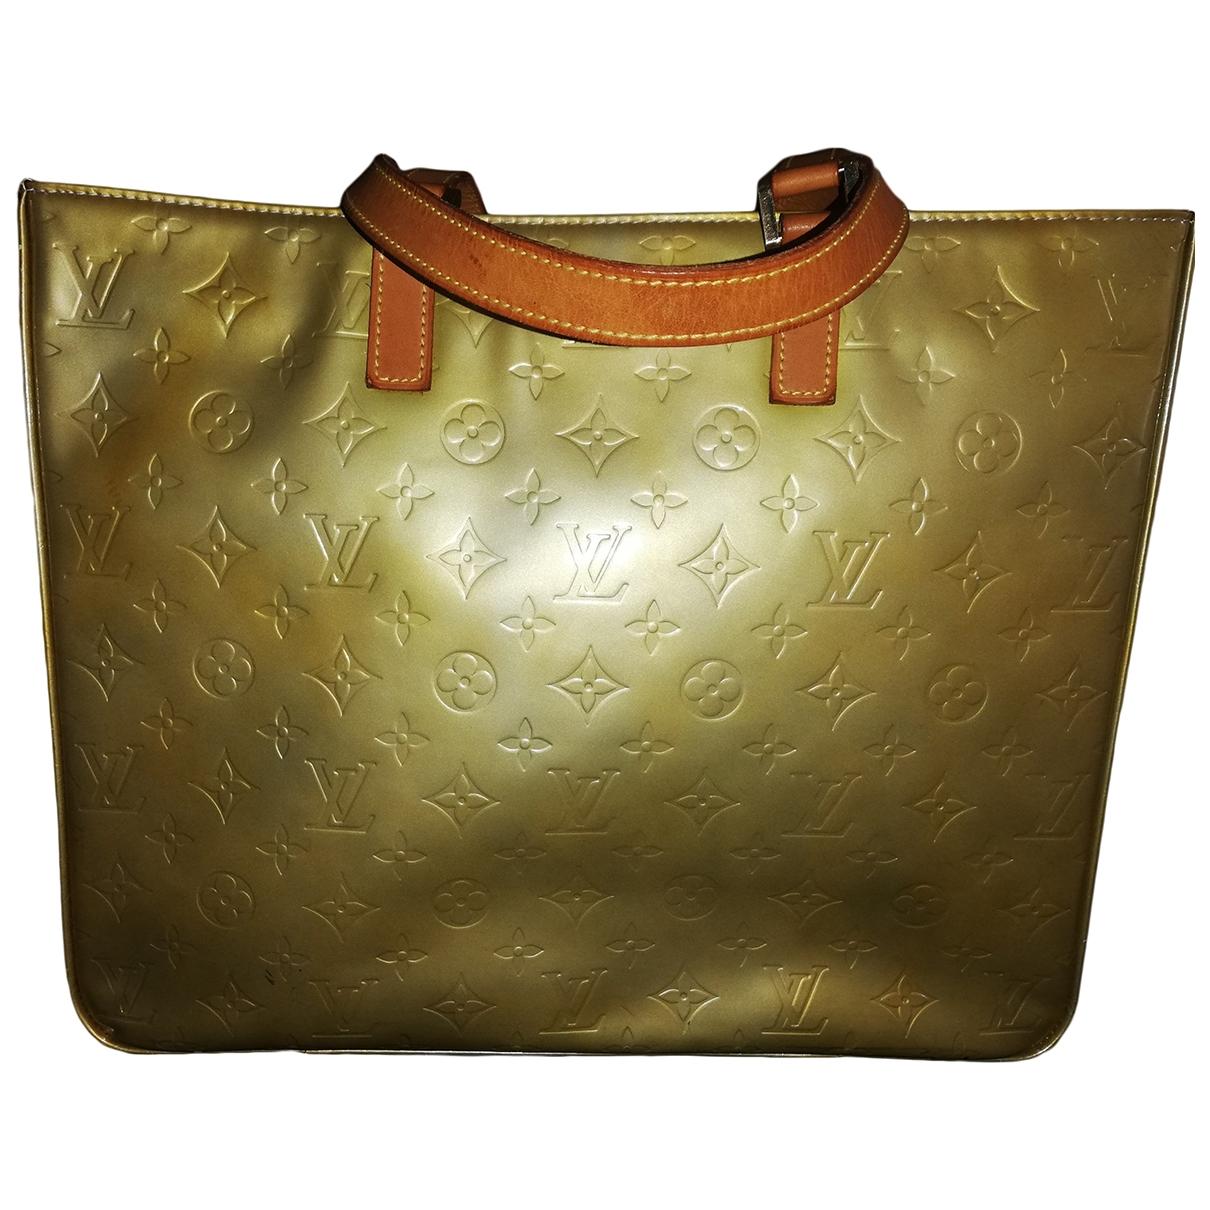 Louis Vuitton Columbus Gold Patent leather handbag for Women \N